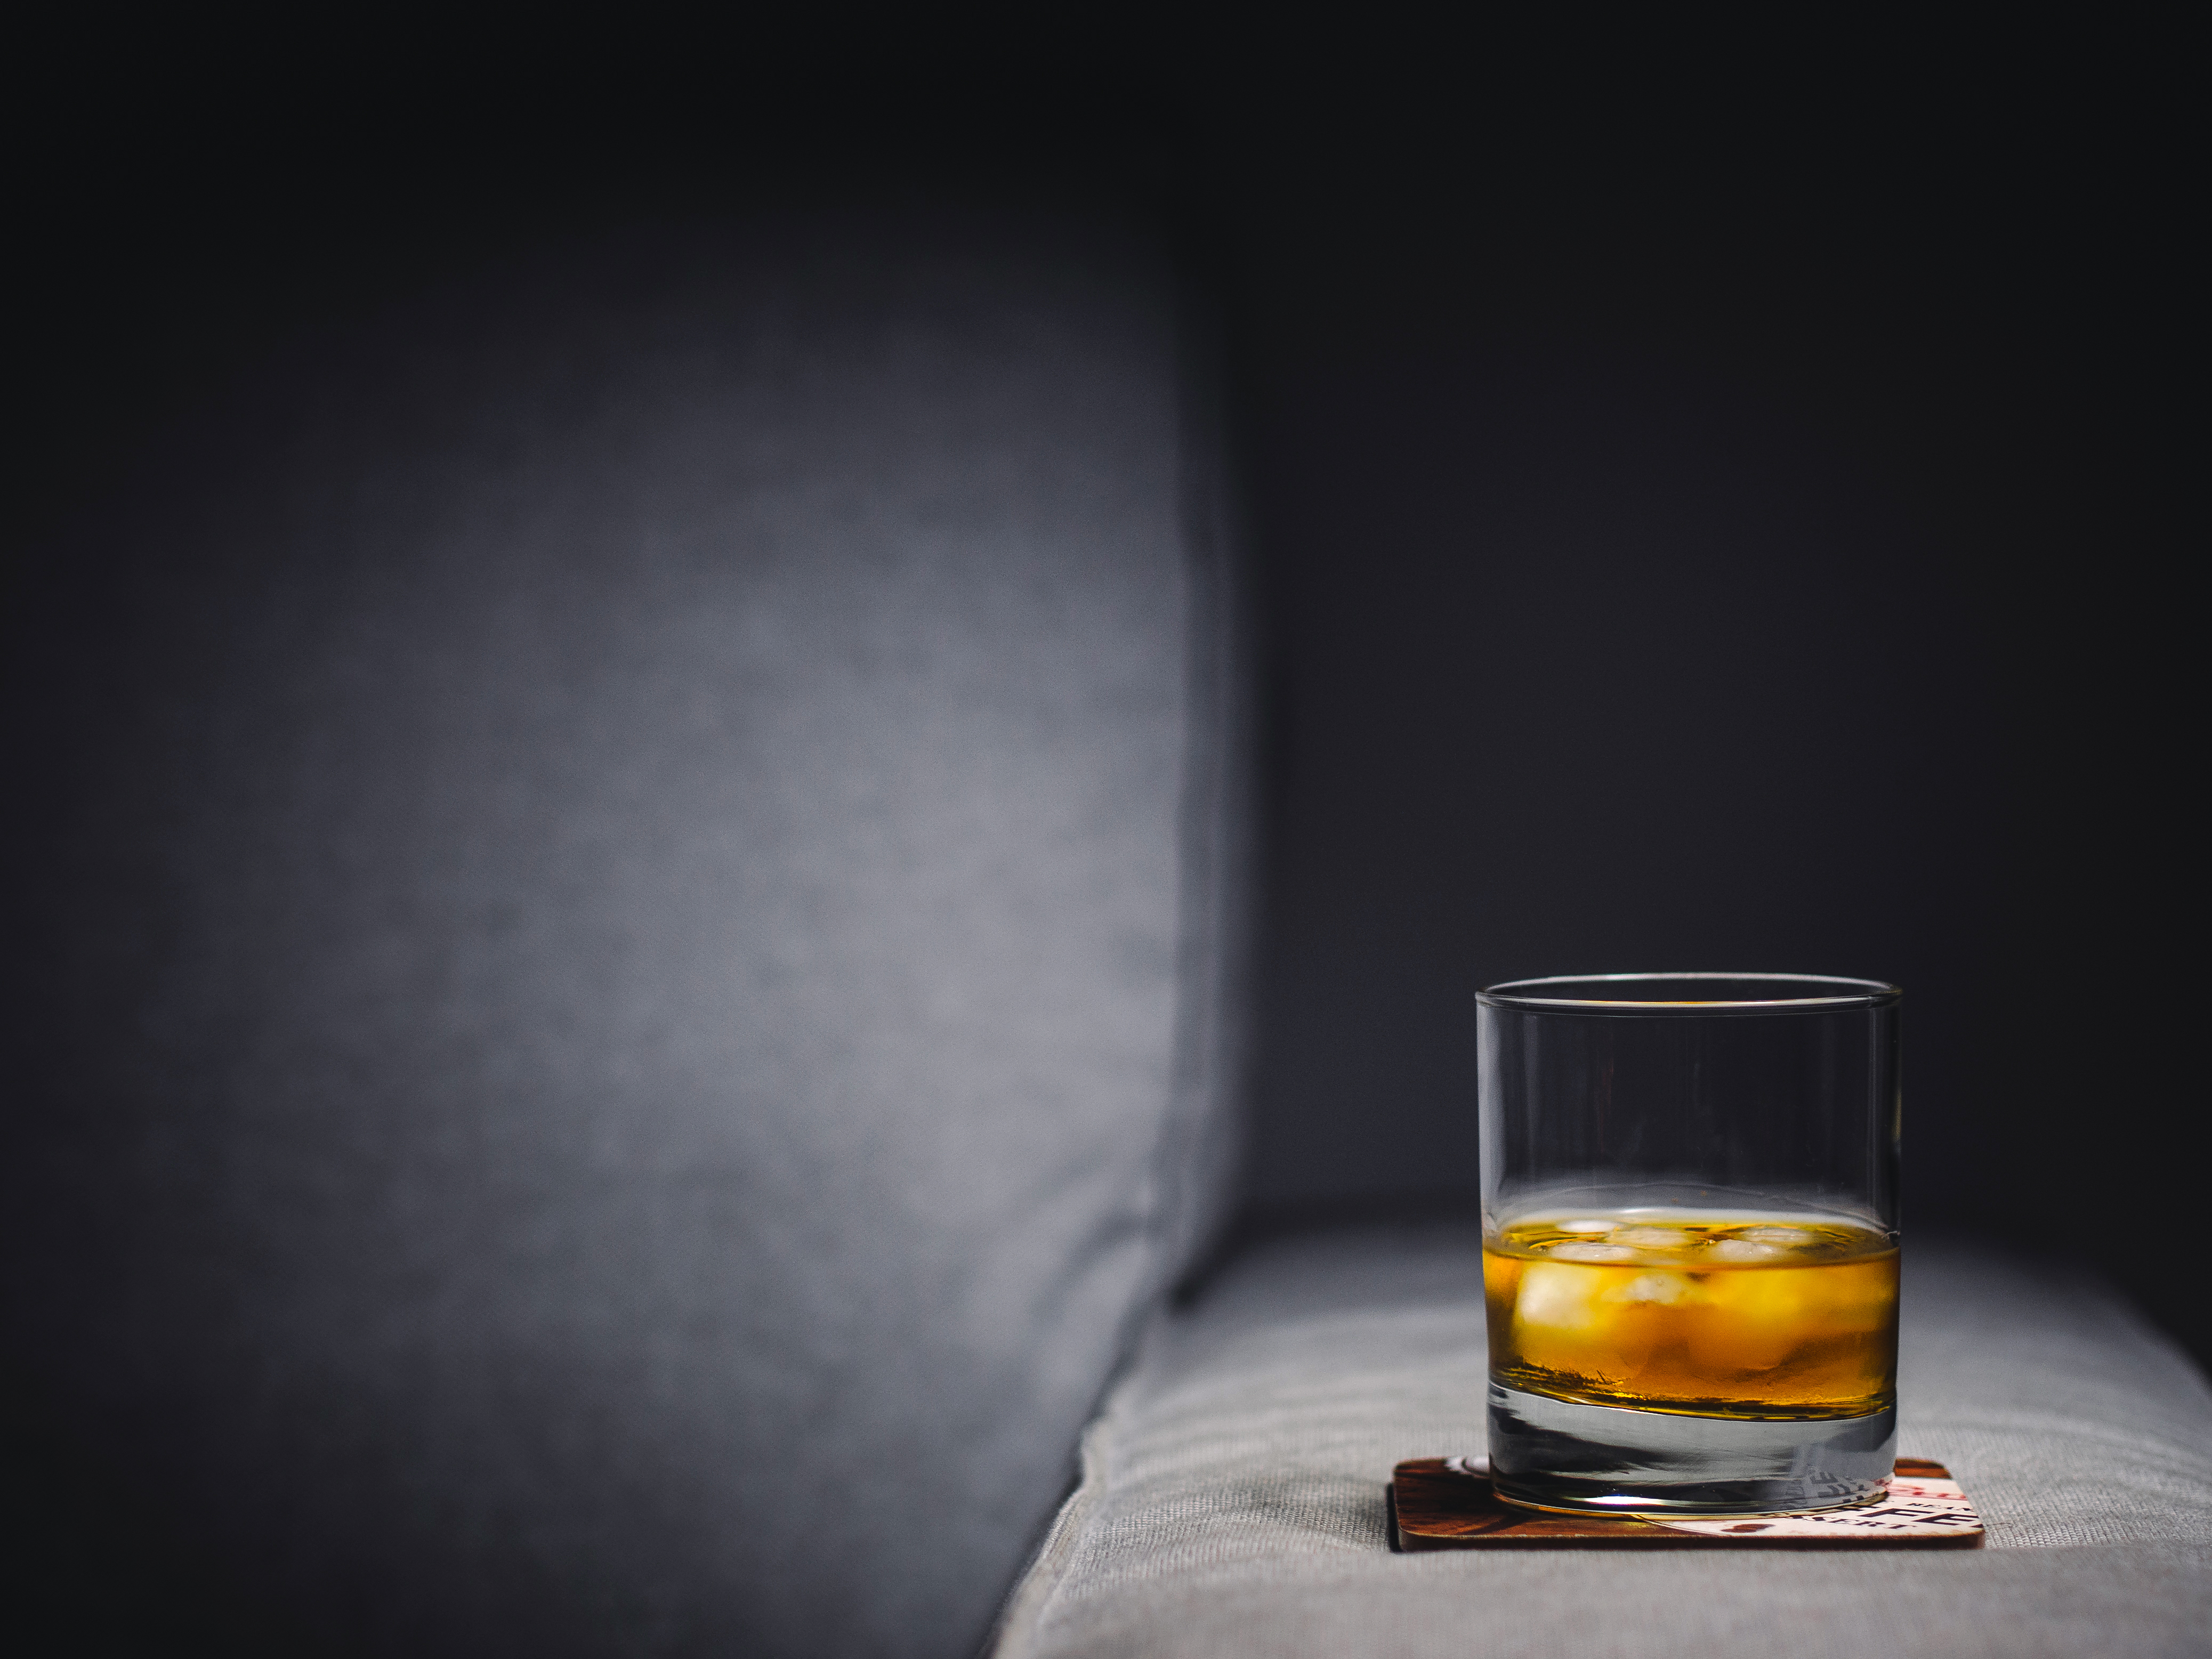 Photographystockphoto photographystockimages photographystock picture - Free Stock Photo Of Cold Alcohol Drink Glass